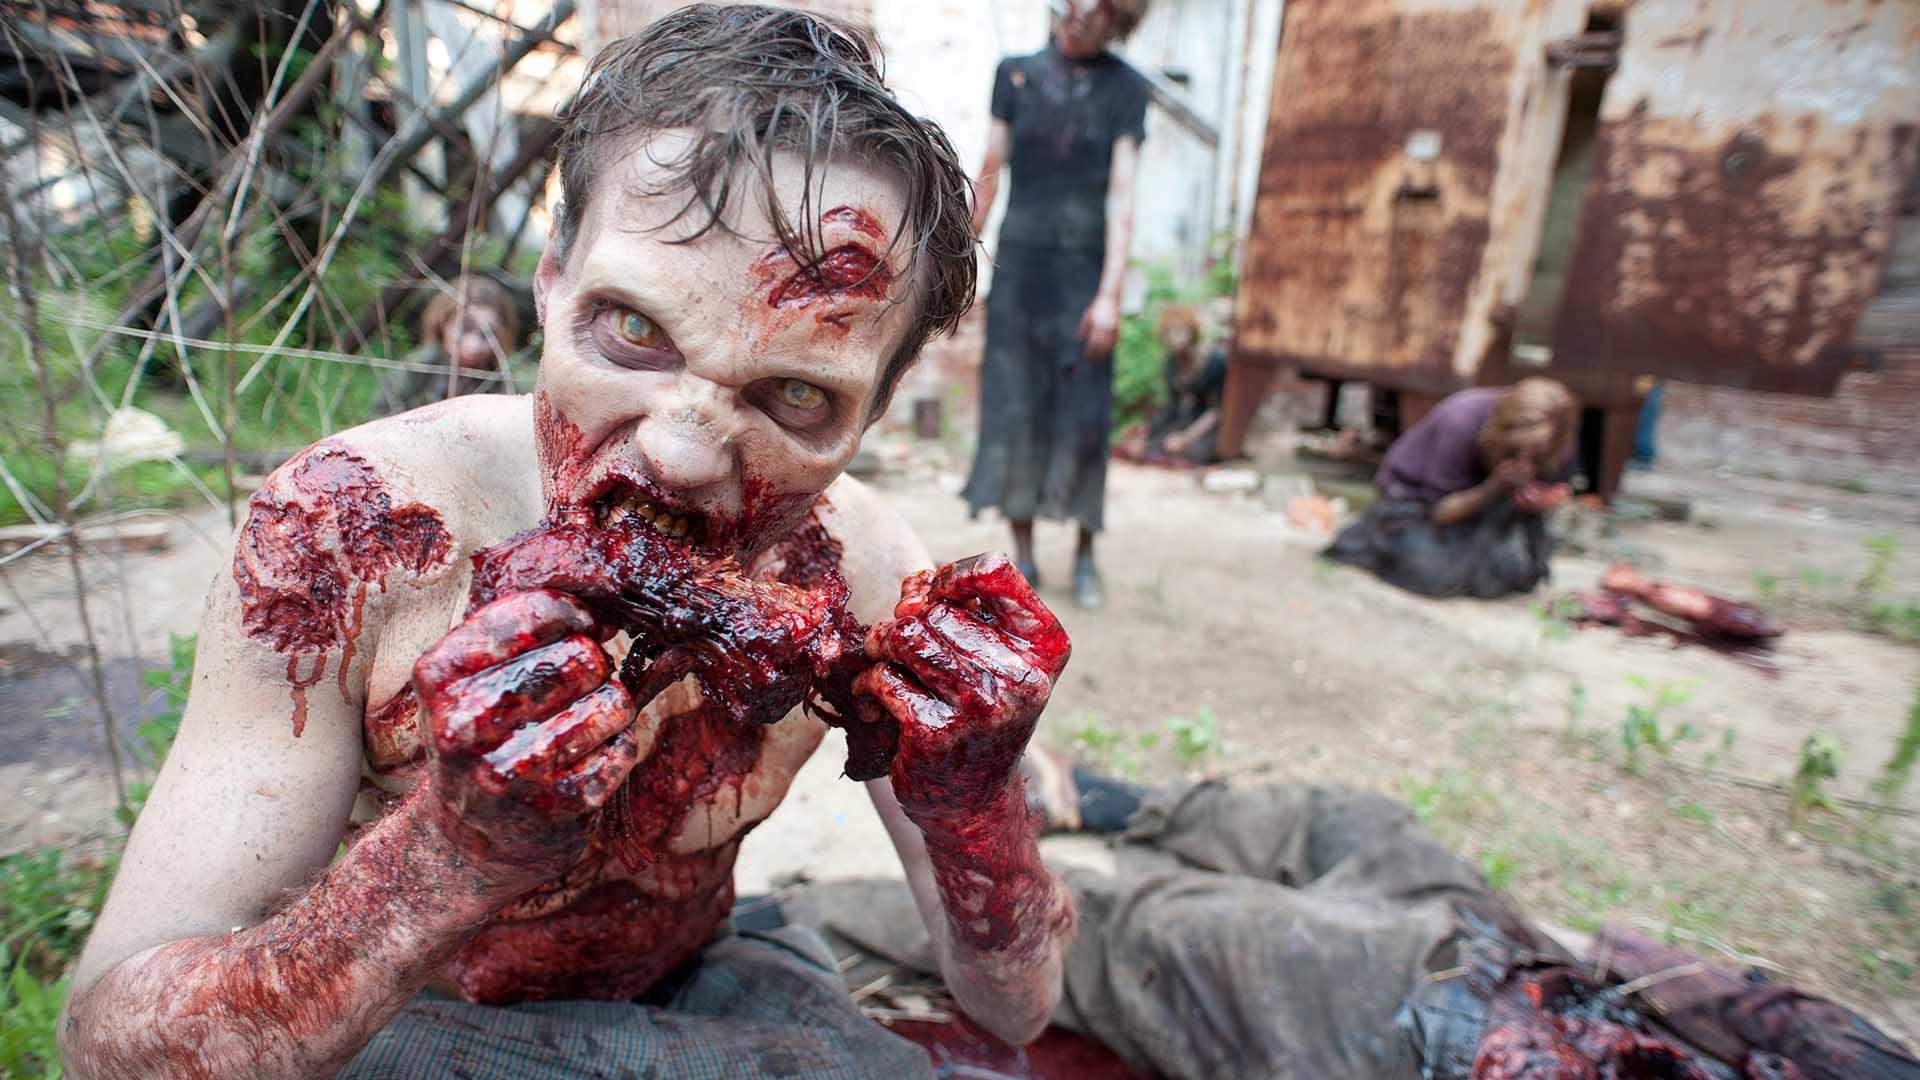 zombie-guts